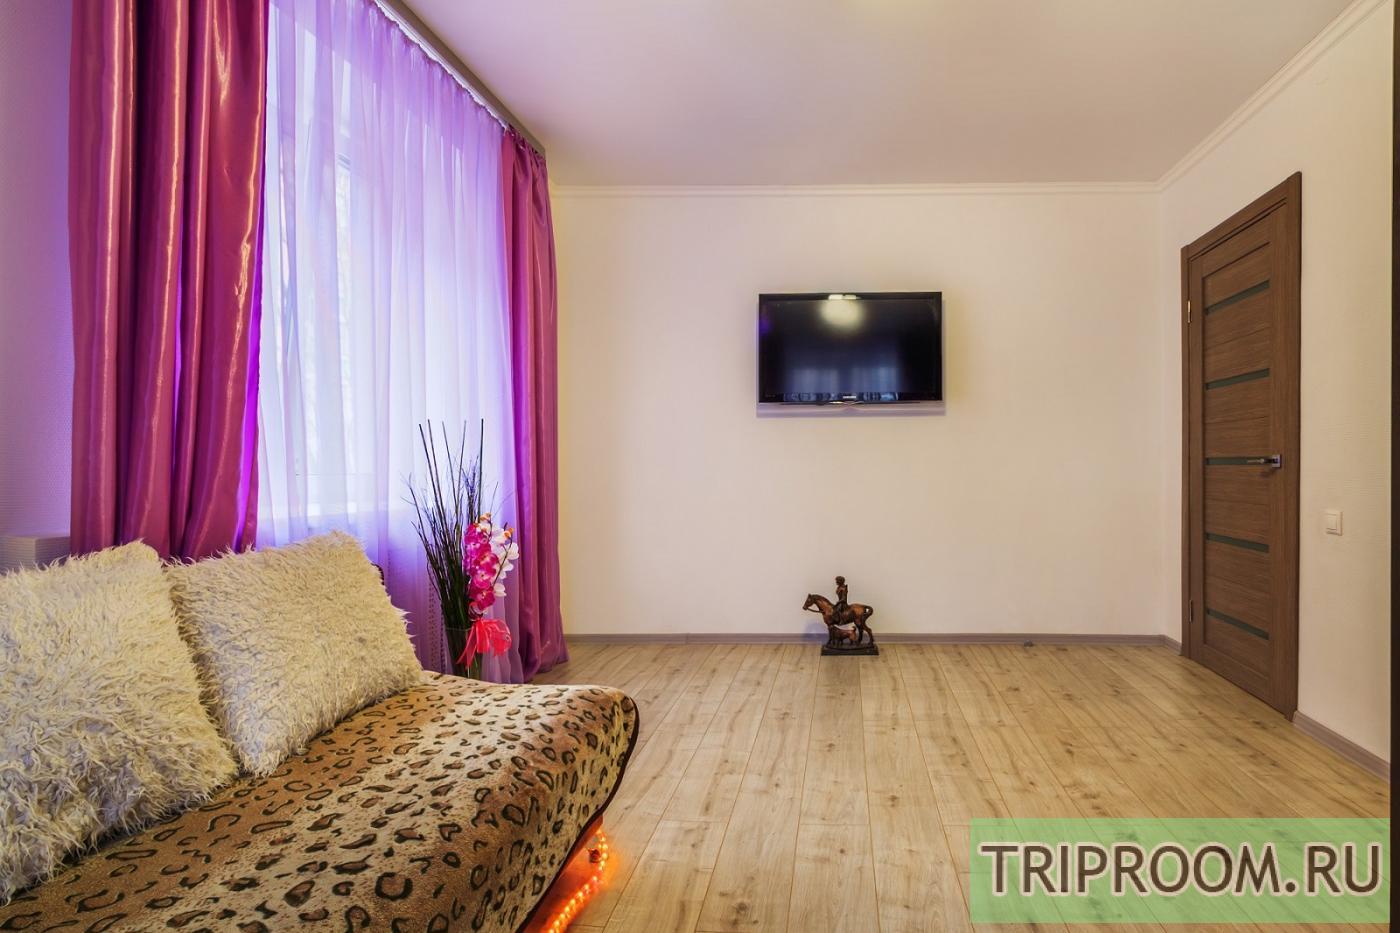 2-комнатная квартира посуточно (вариант № 11539), ул. Семашко переулок, фото № 3